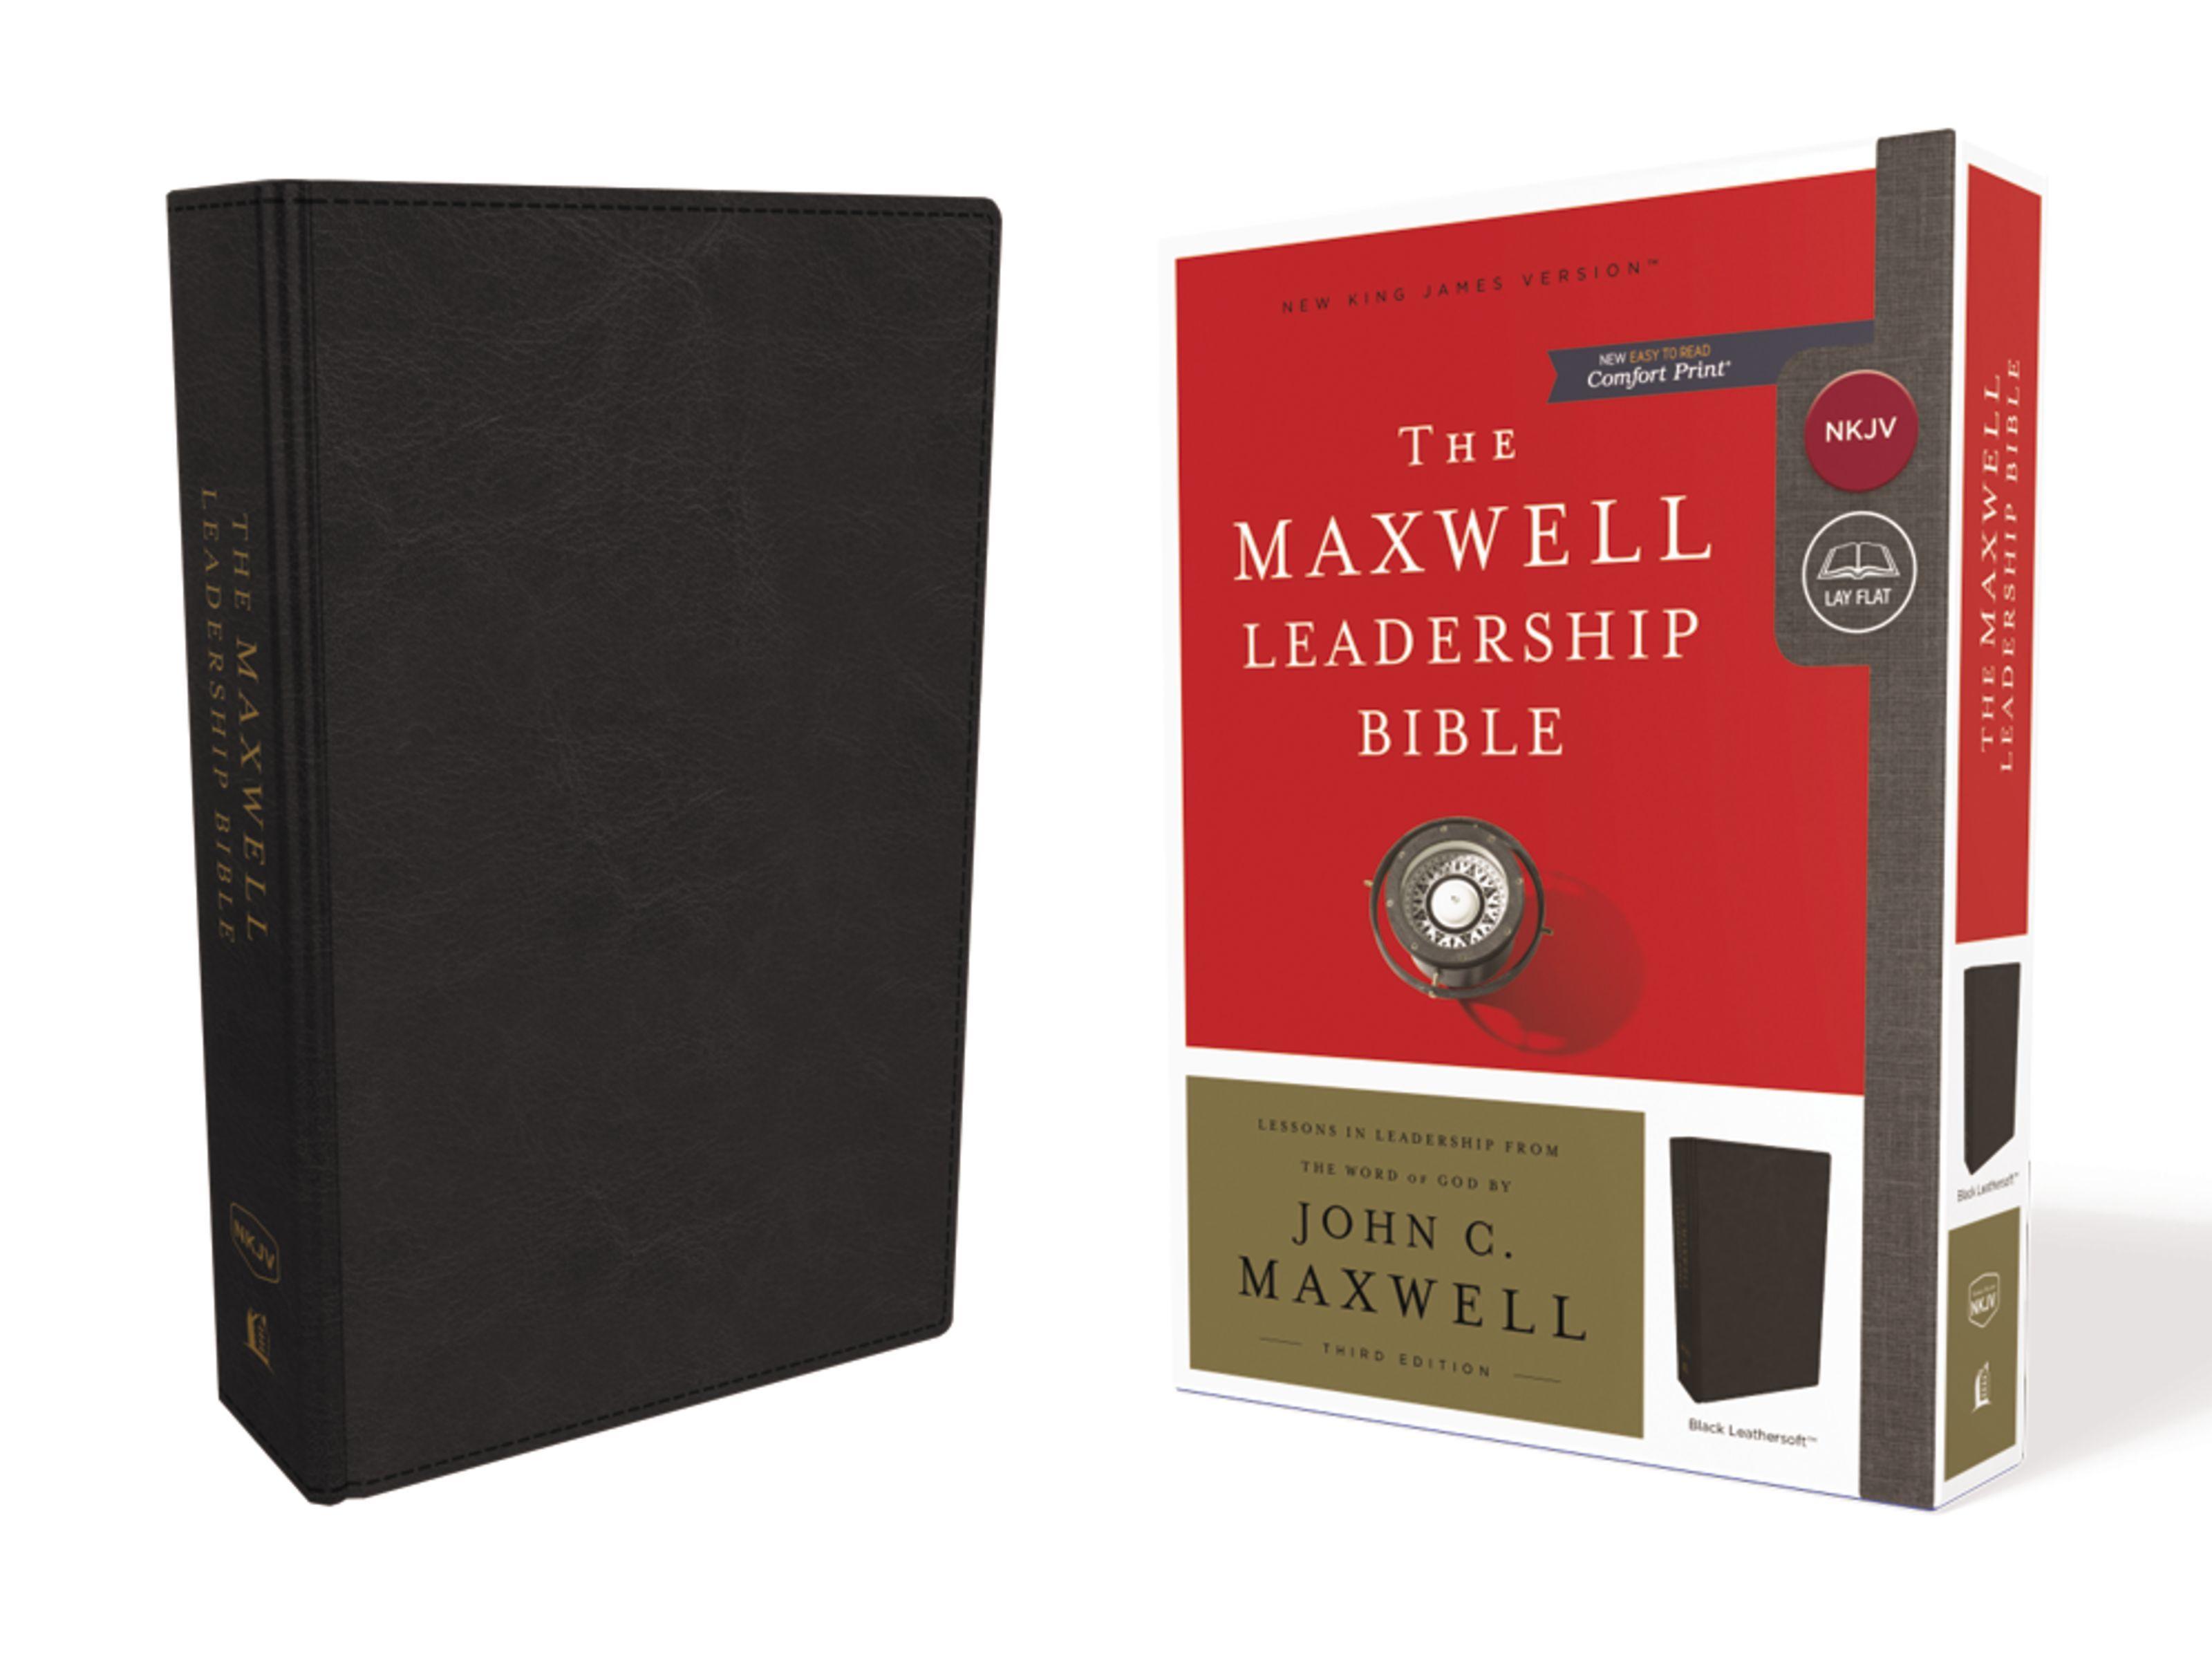 Maxwell Leadership Bible- NKJV